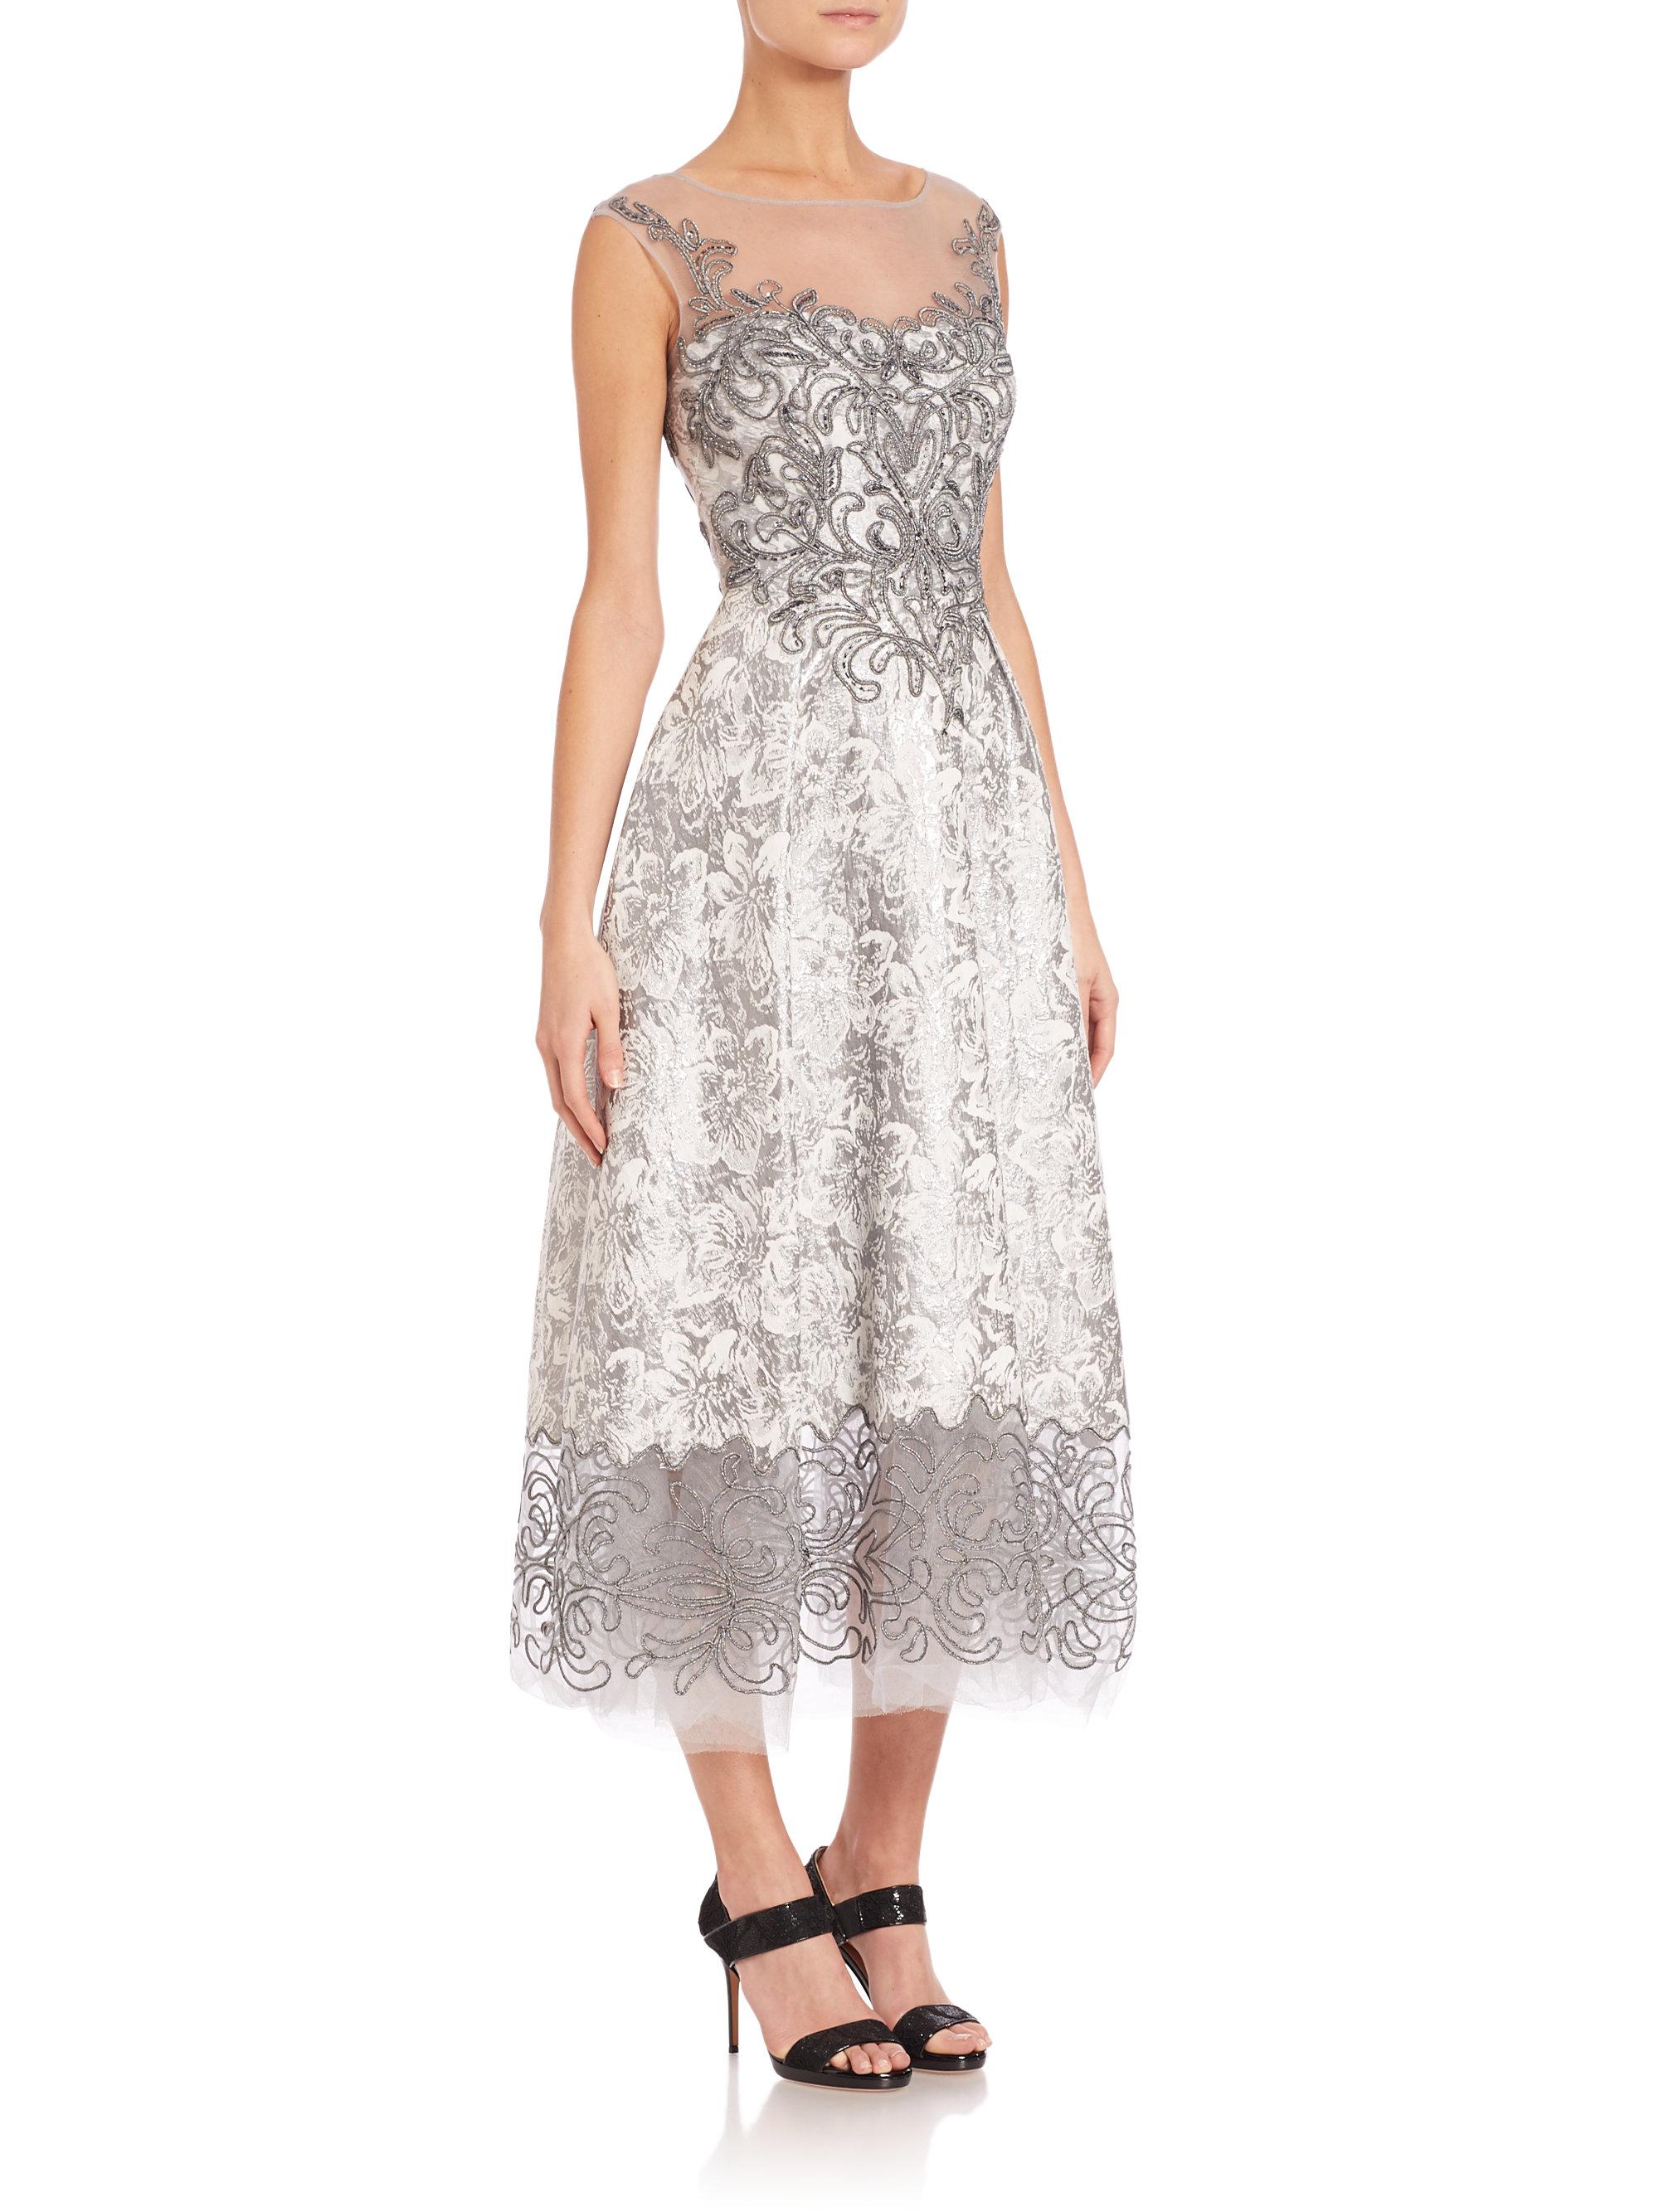 Lyst - Teri Jon Floral Lace Illusion Dress in Metallic 12847c402